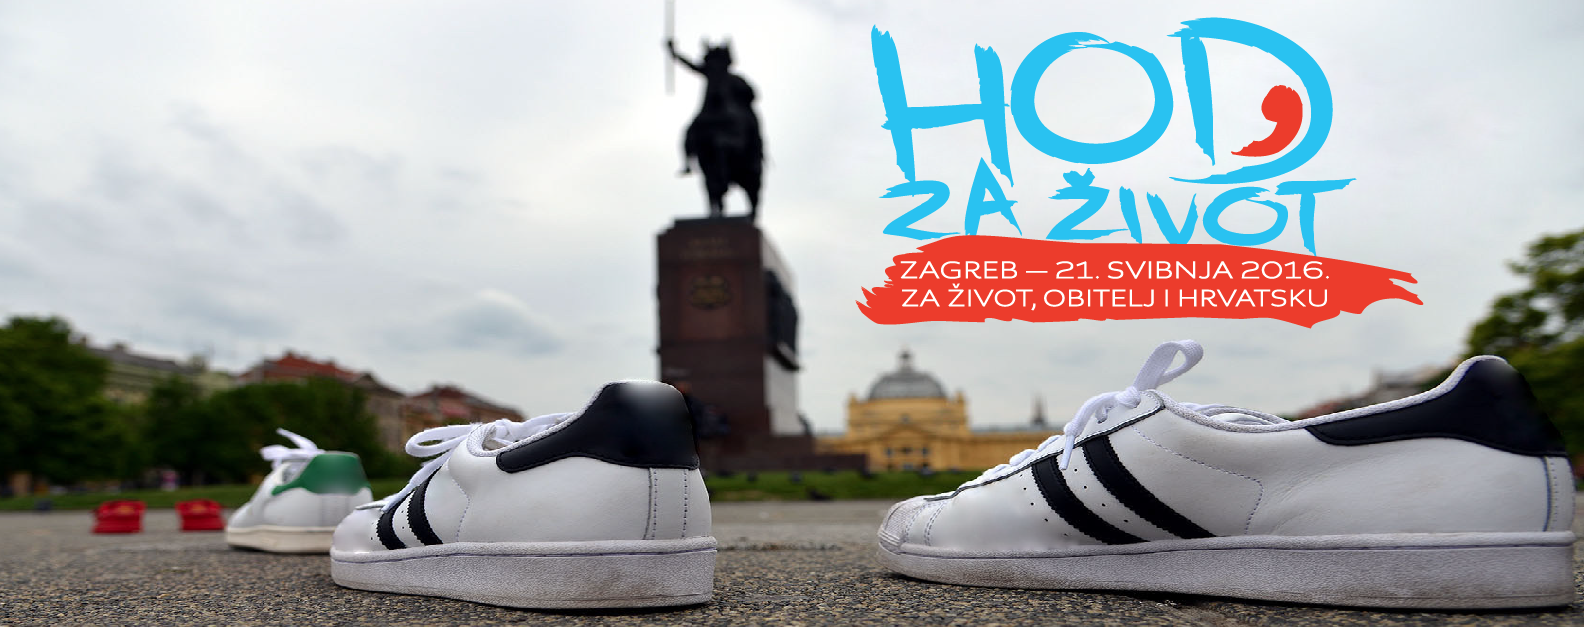 Prvi nacionalni Hod za život – Zagreb, subota, 21.5.2016